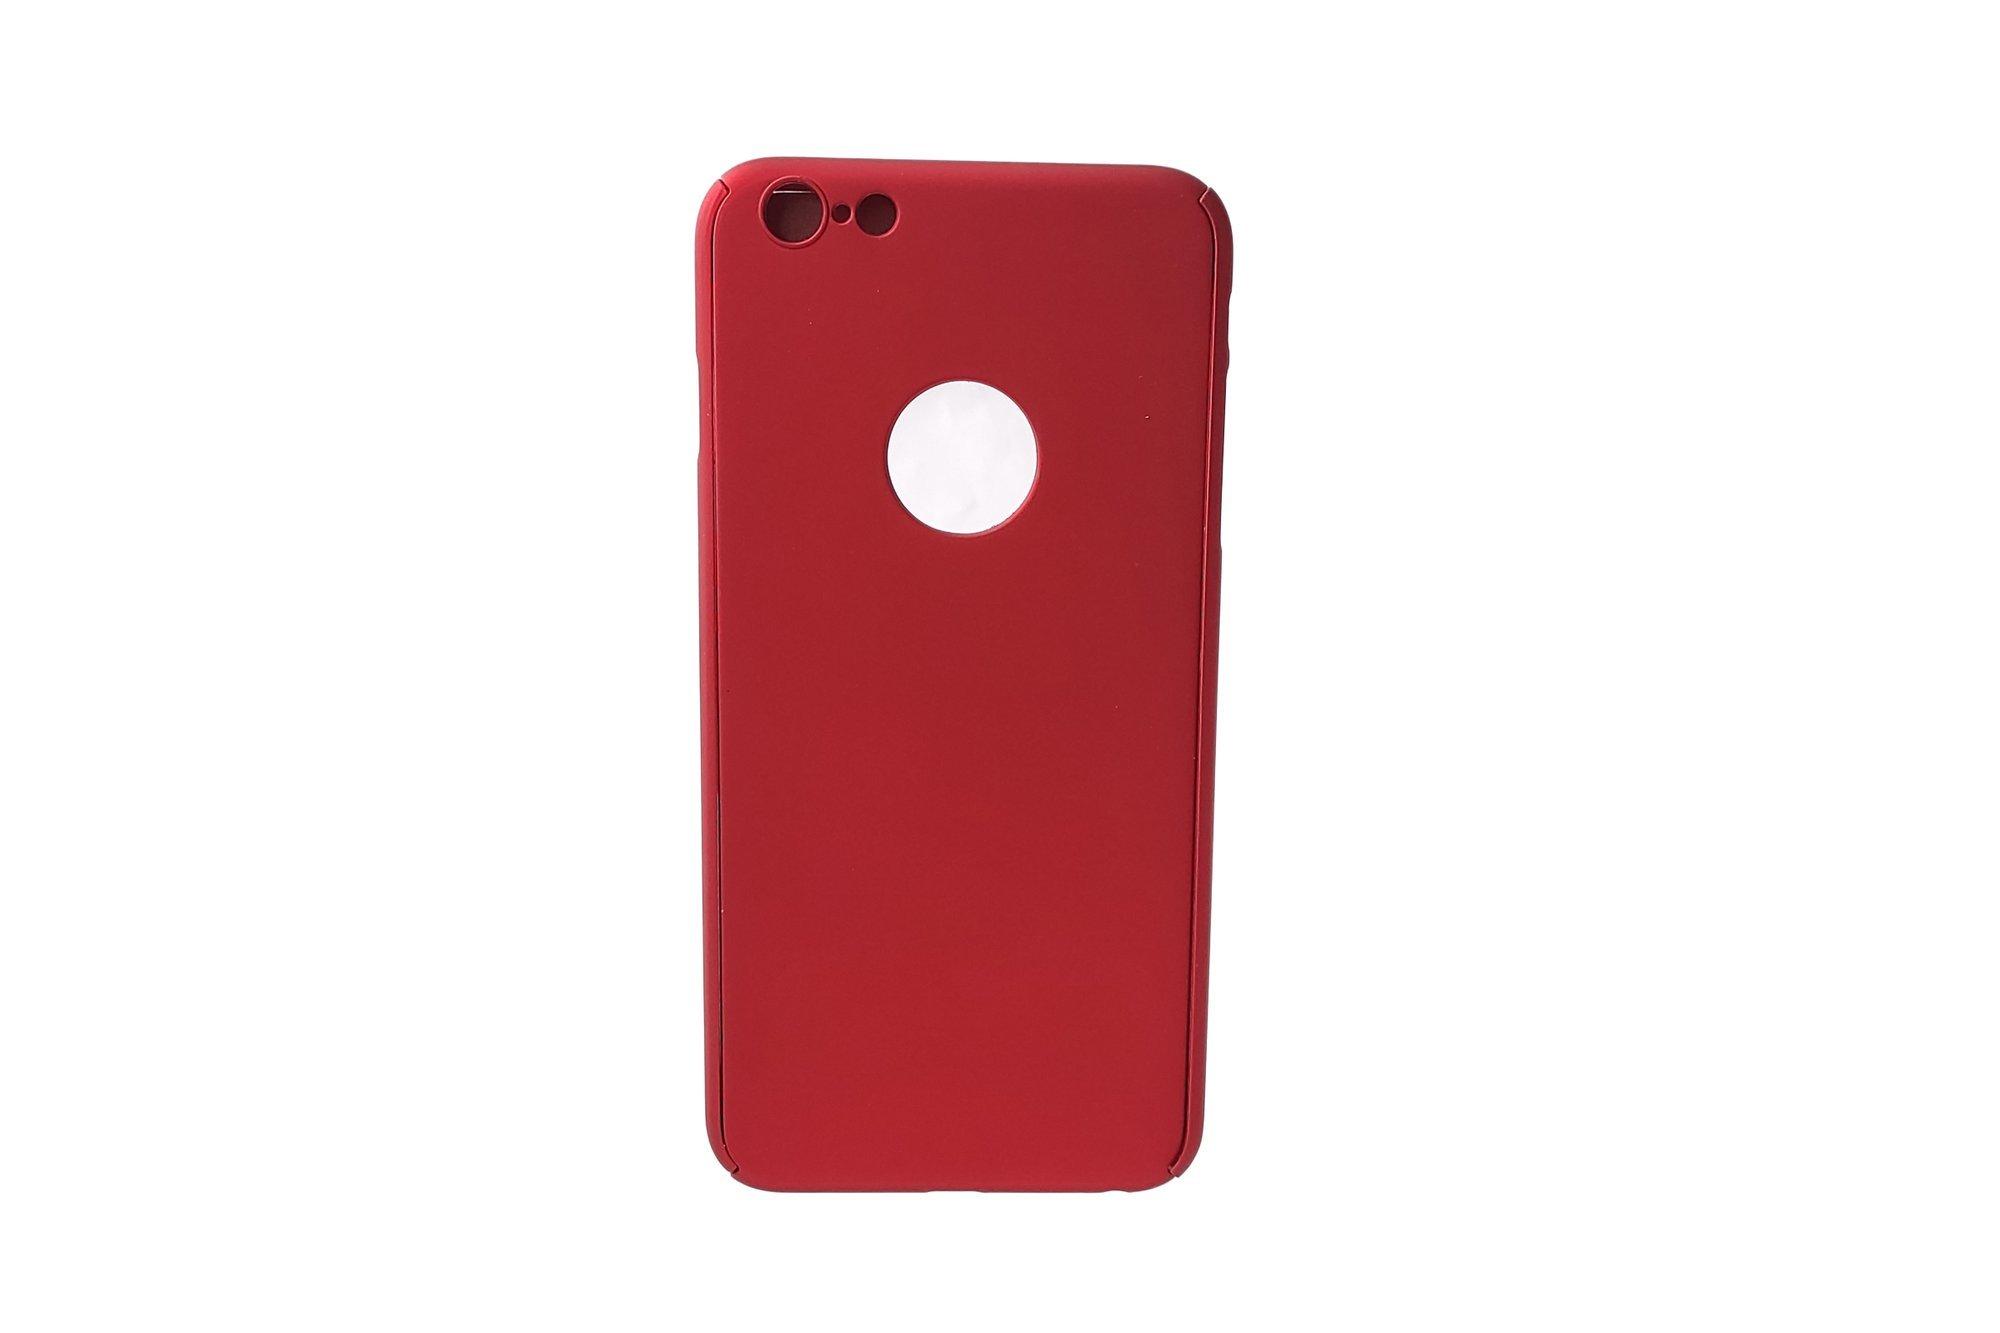 2in1 Hybrid 360° Full Protection Case Voero Apple iPhone 6+ / 6S+ Metallic Red